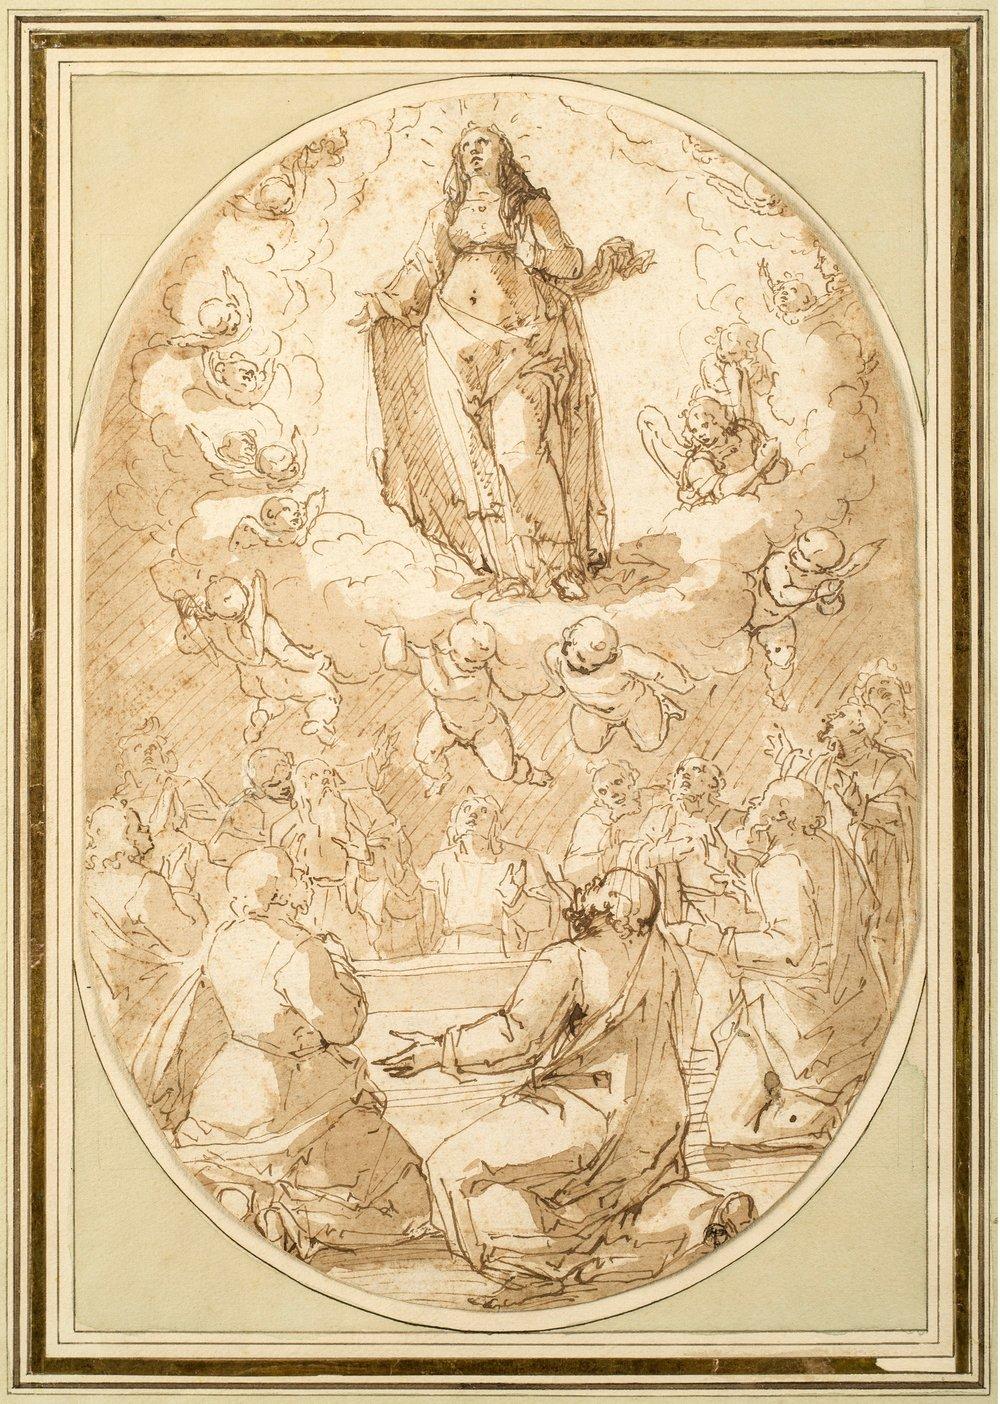 Giovanni Battista Paggi,  The Assumption of the Virgin